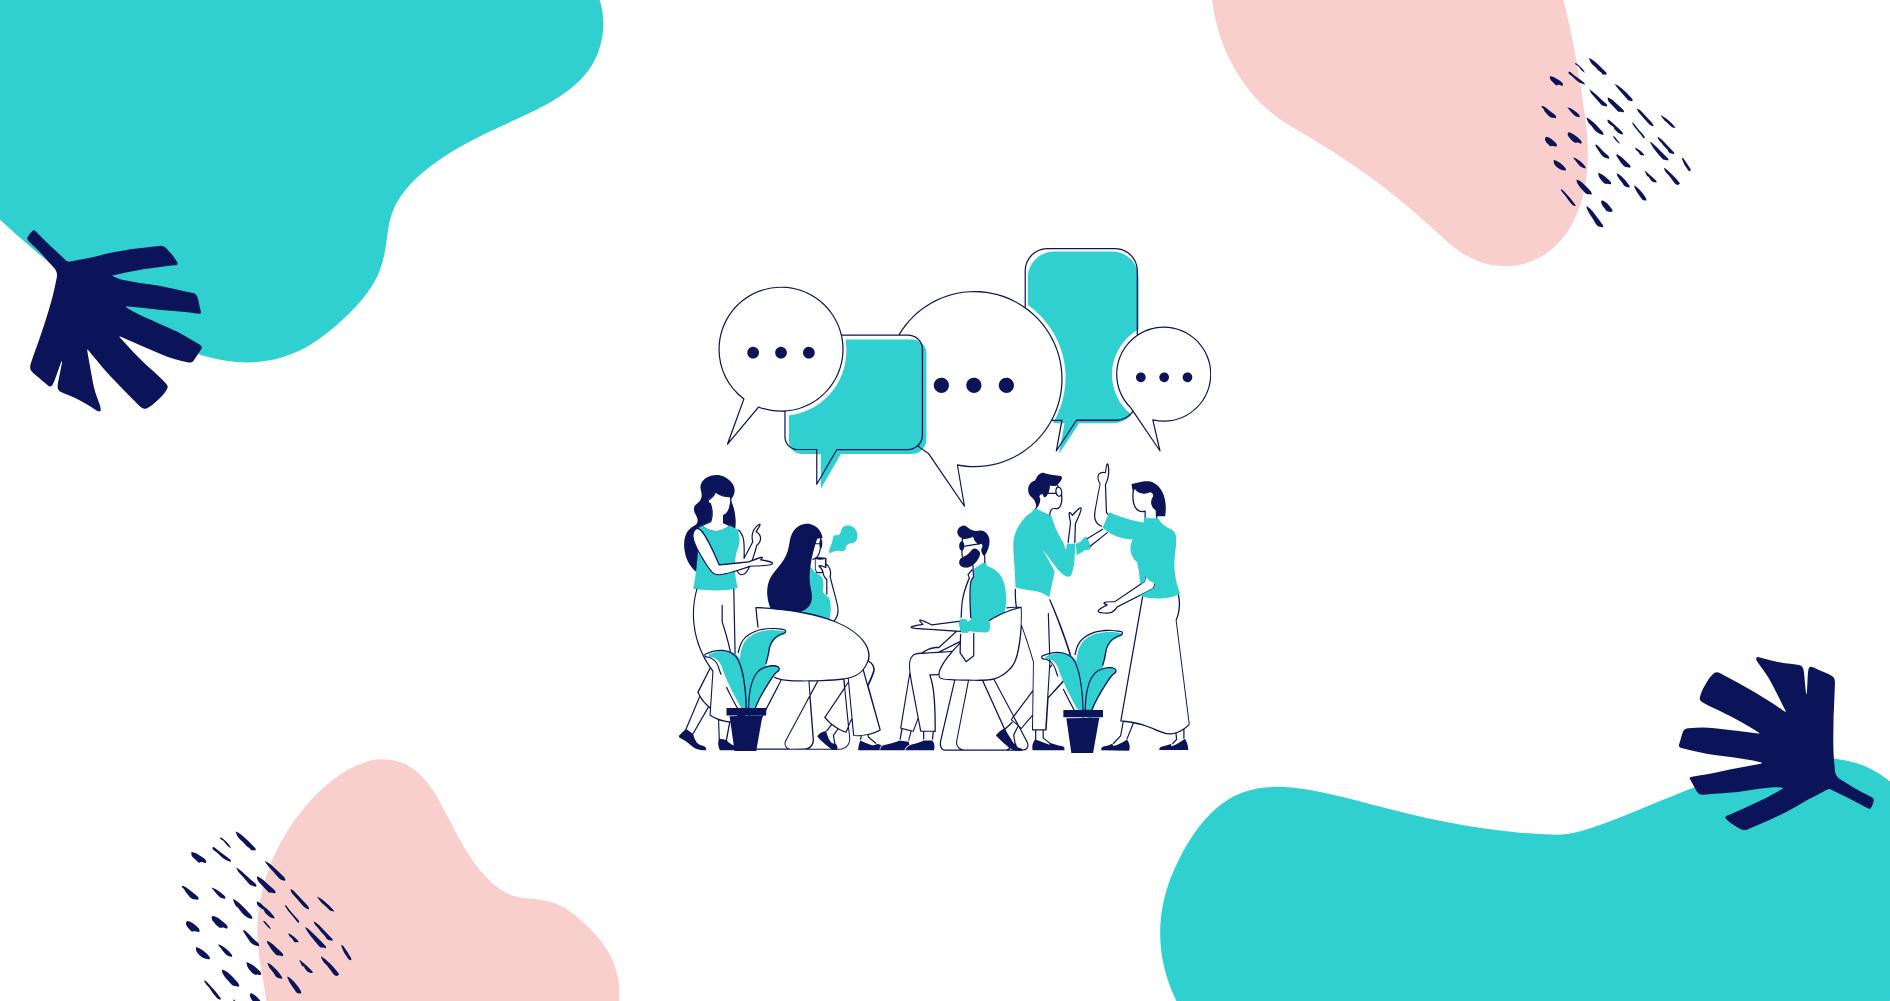 7 Useful Tips on Managing Remote Teams andFinances - Teamwork - Helppier Blog